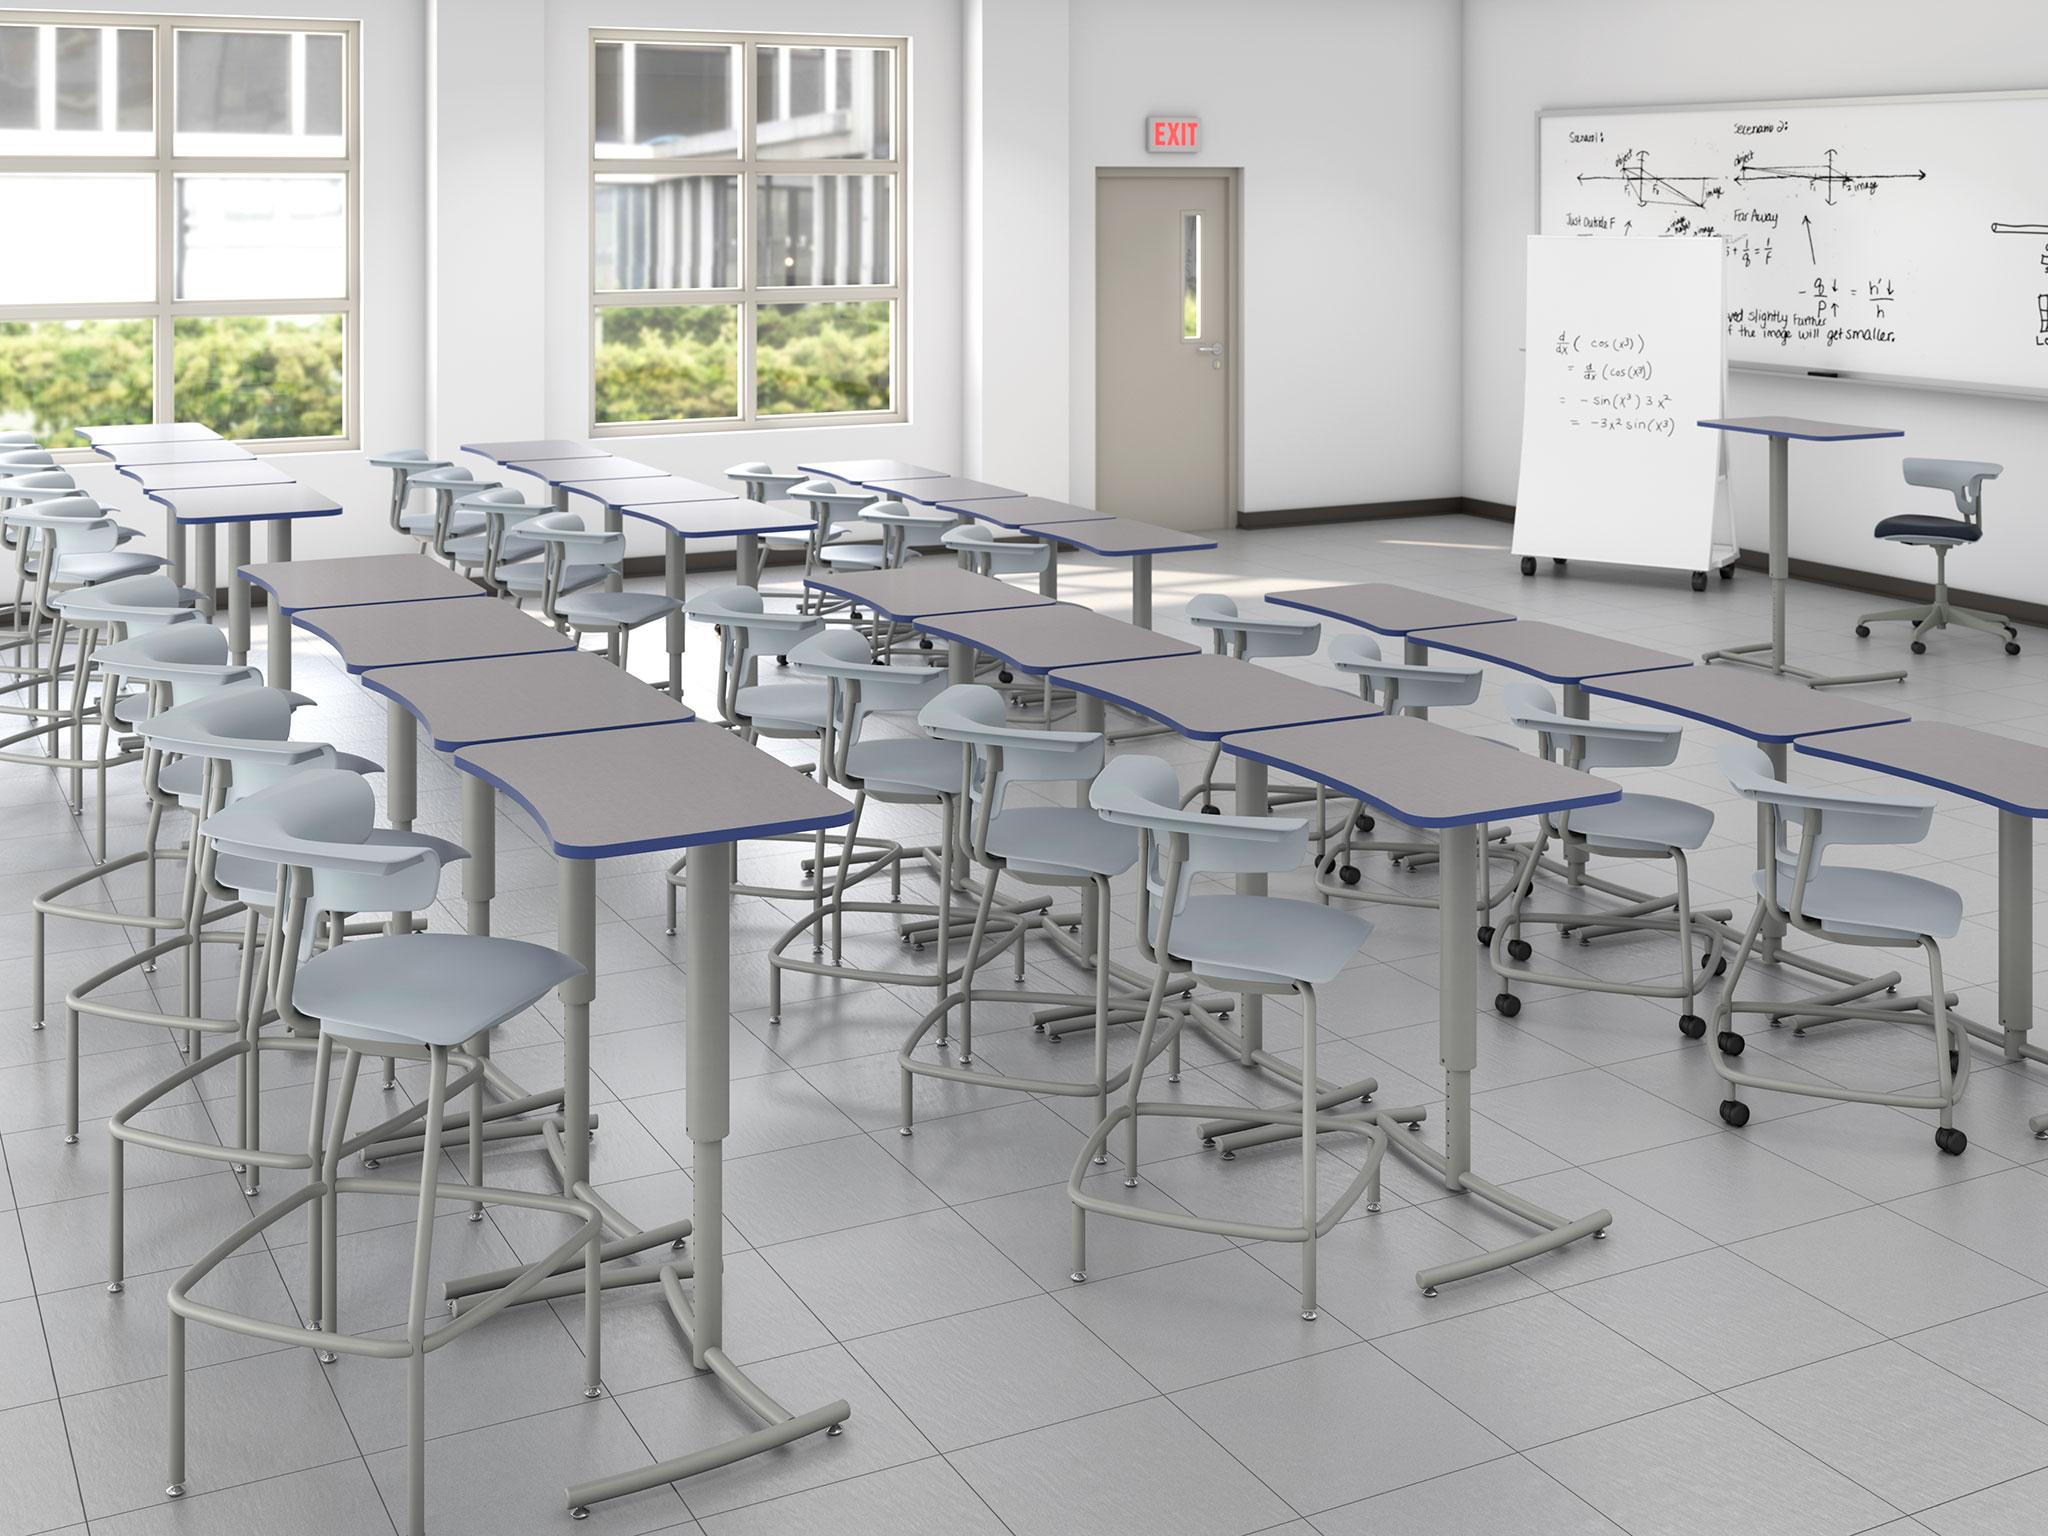 Ruckus_tiered classroom.jpg